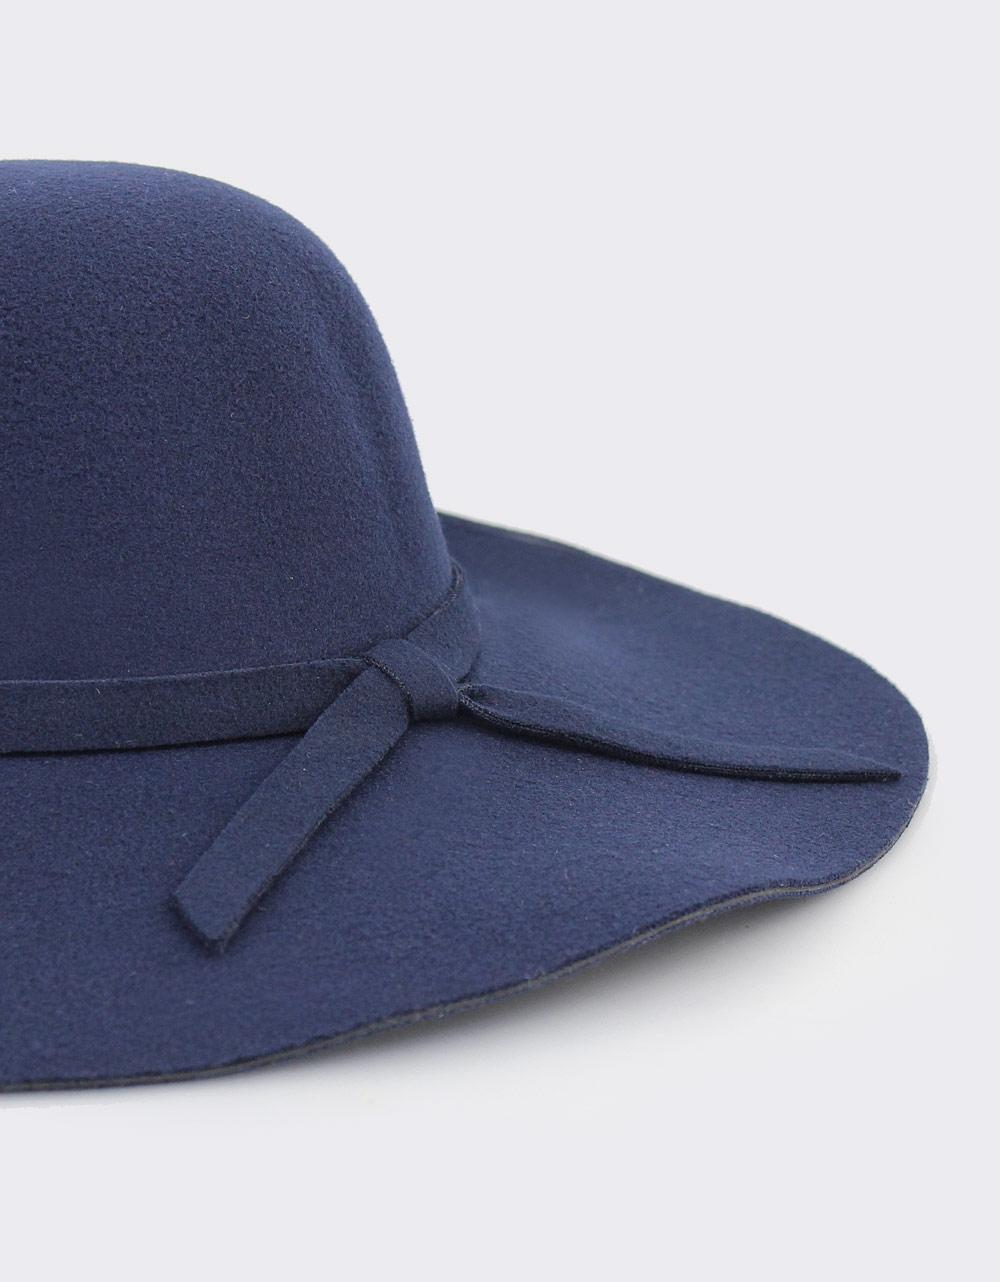 6f67c600ac Εικόνα από Γυναικεία καπέλα από τσόχα με φιόγκο Μπλε